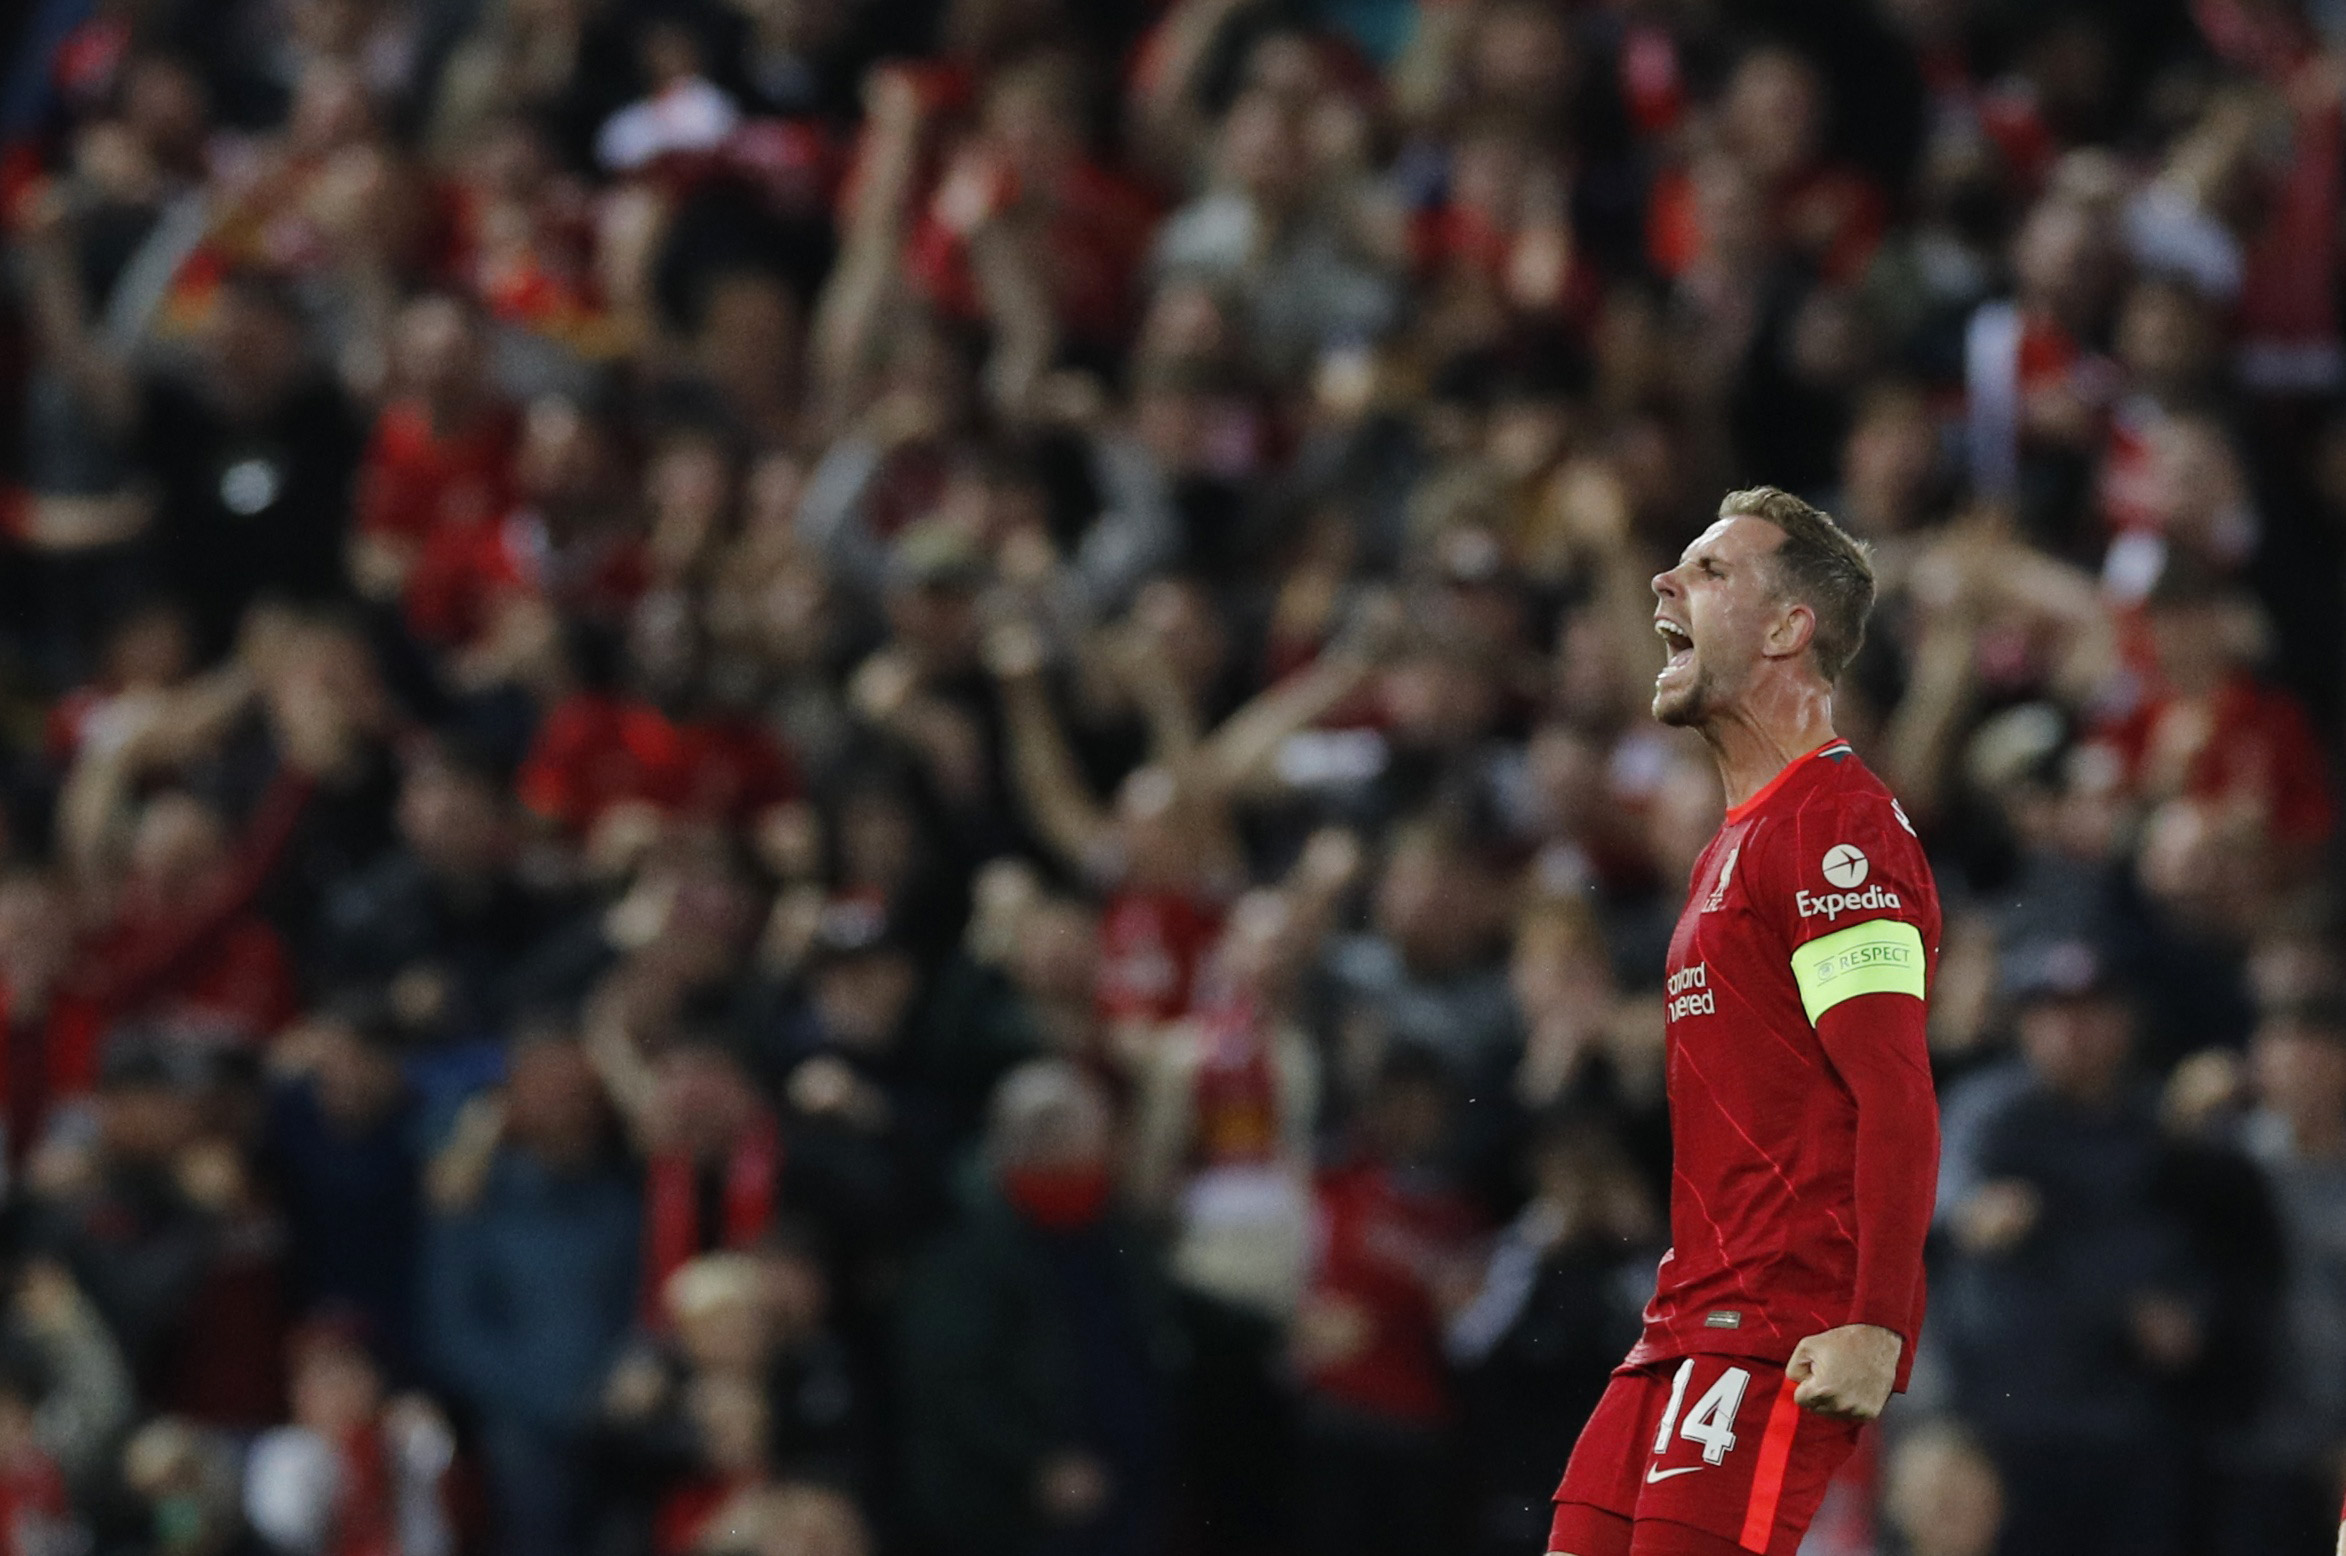 Champions League, Λίβερπουλ – Μίλαν 3-2: Ματσάρα με δύο ανατροπές στο «Άνφιλντ»